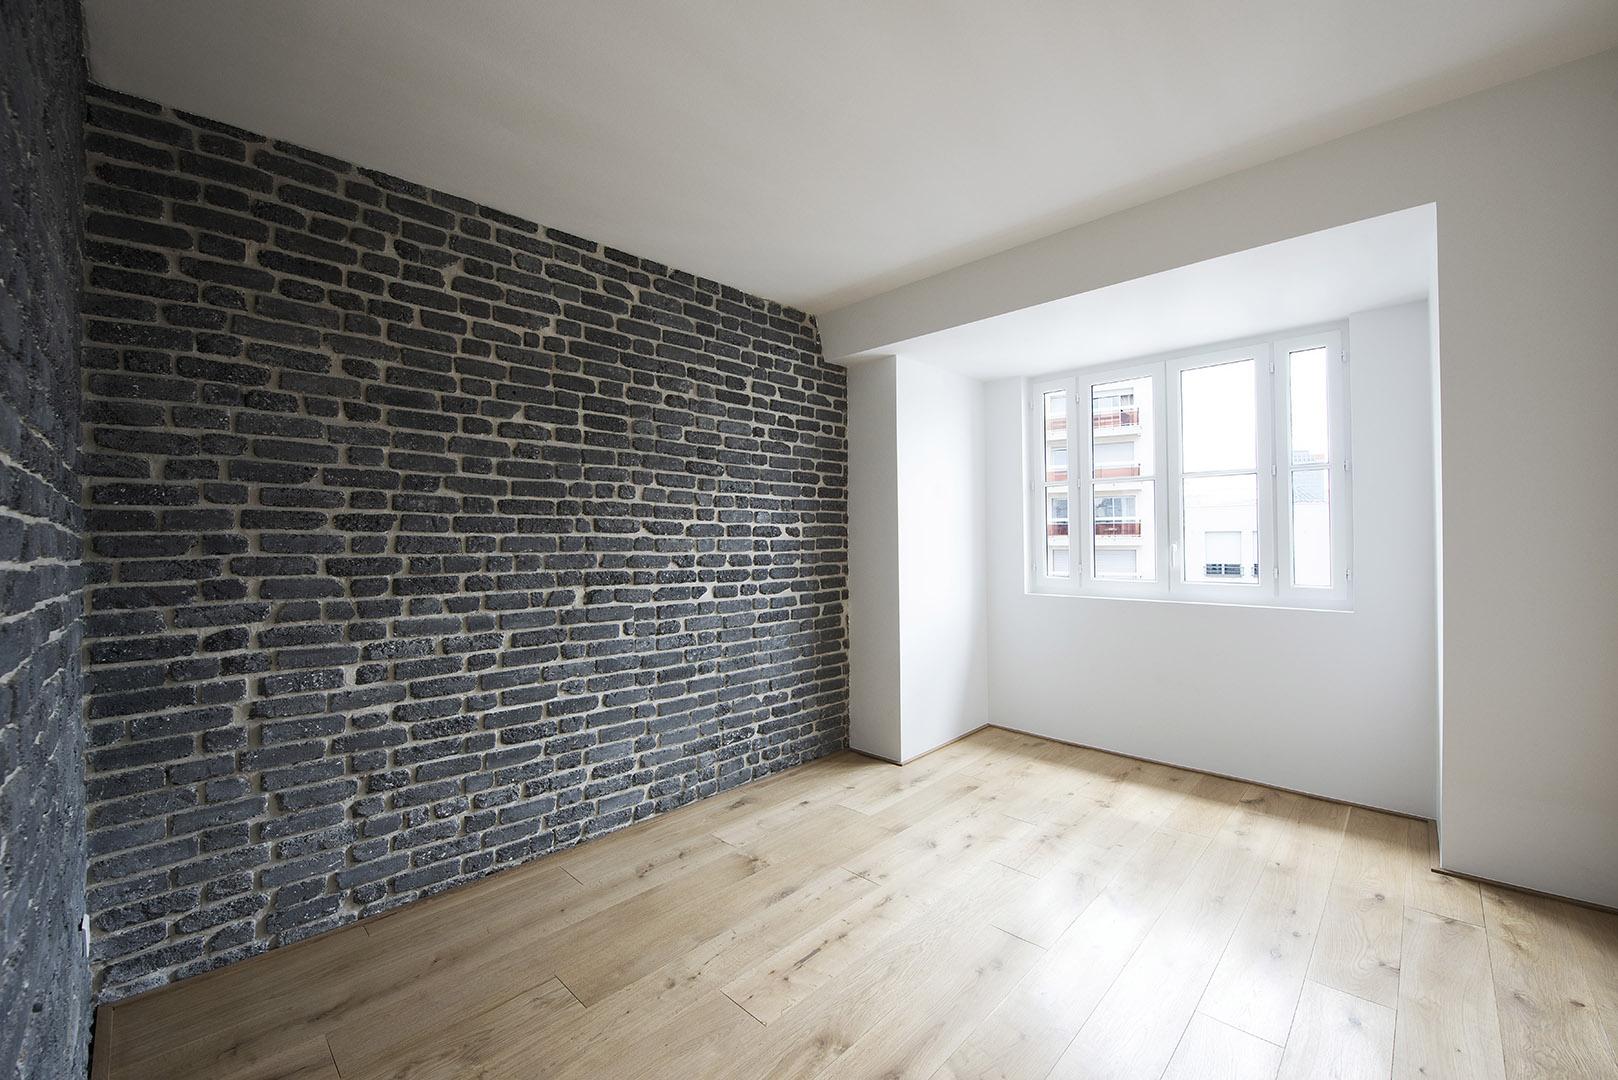 Chambre mur de briques